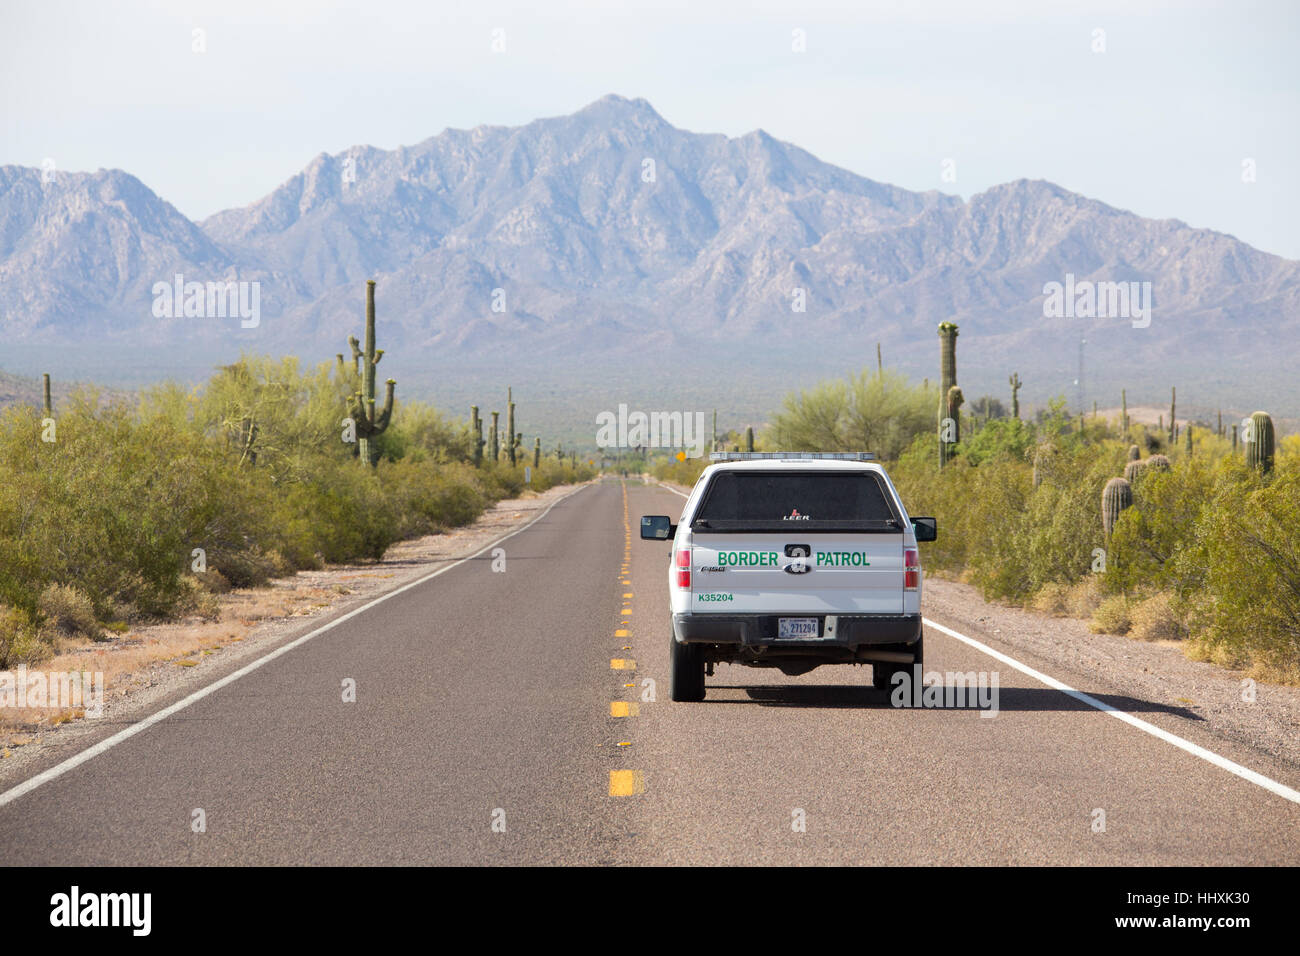 American Border Patrol on the N Ajo Sonoita Highwaynear the Lukeville, Arizona, USA and Sonoyta, Mexico border Crossing - Stock Image